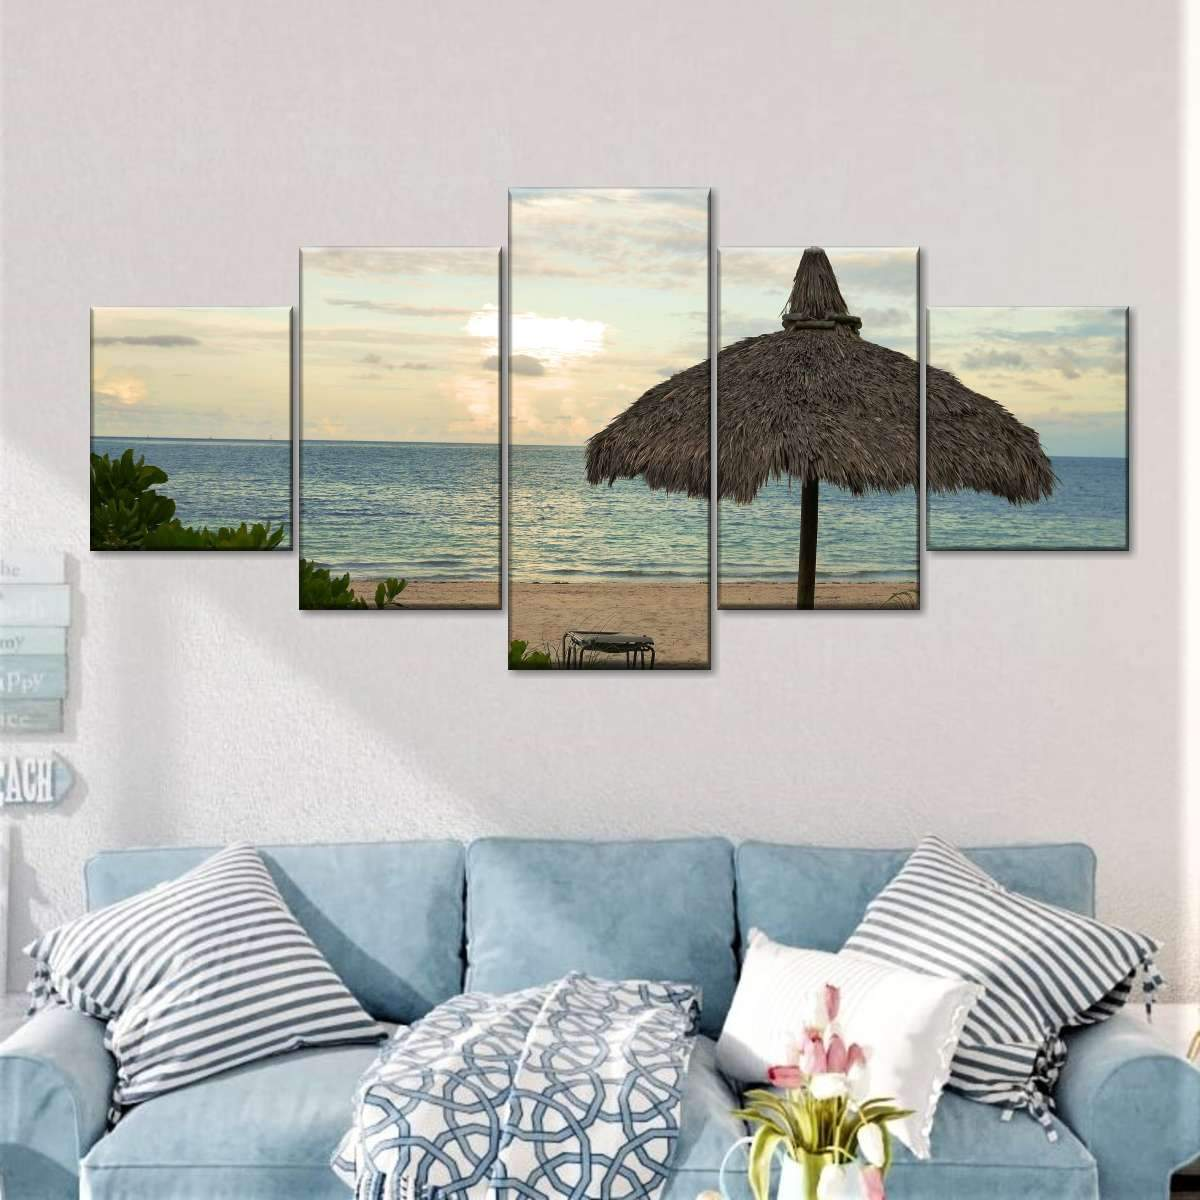 Tamarindo Beach Multi Panel Canvas Wall Art